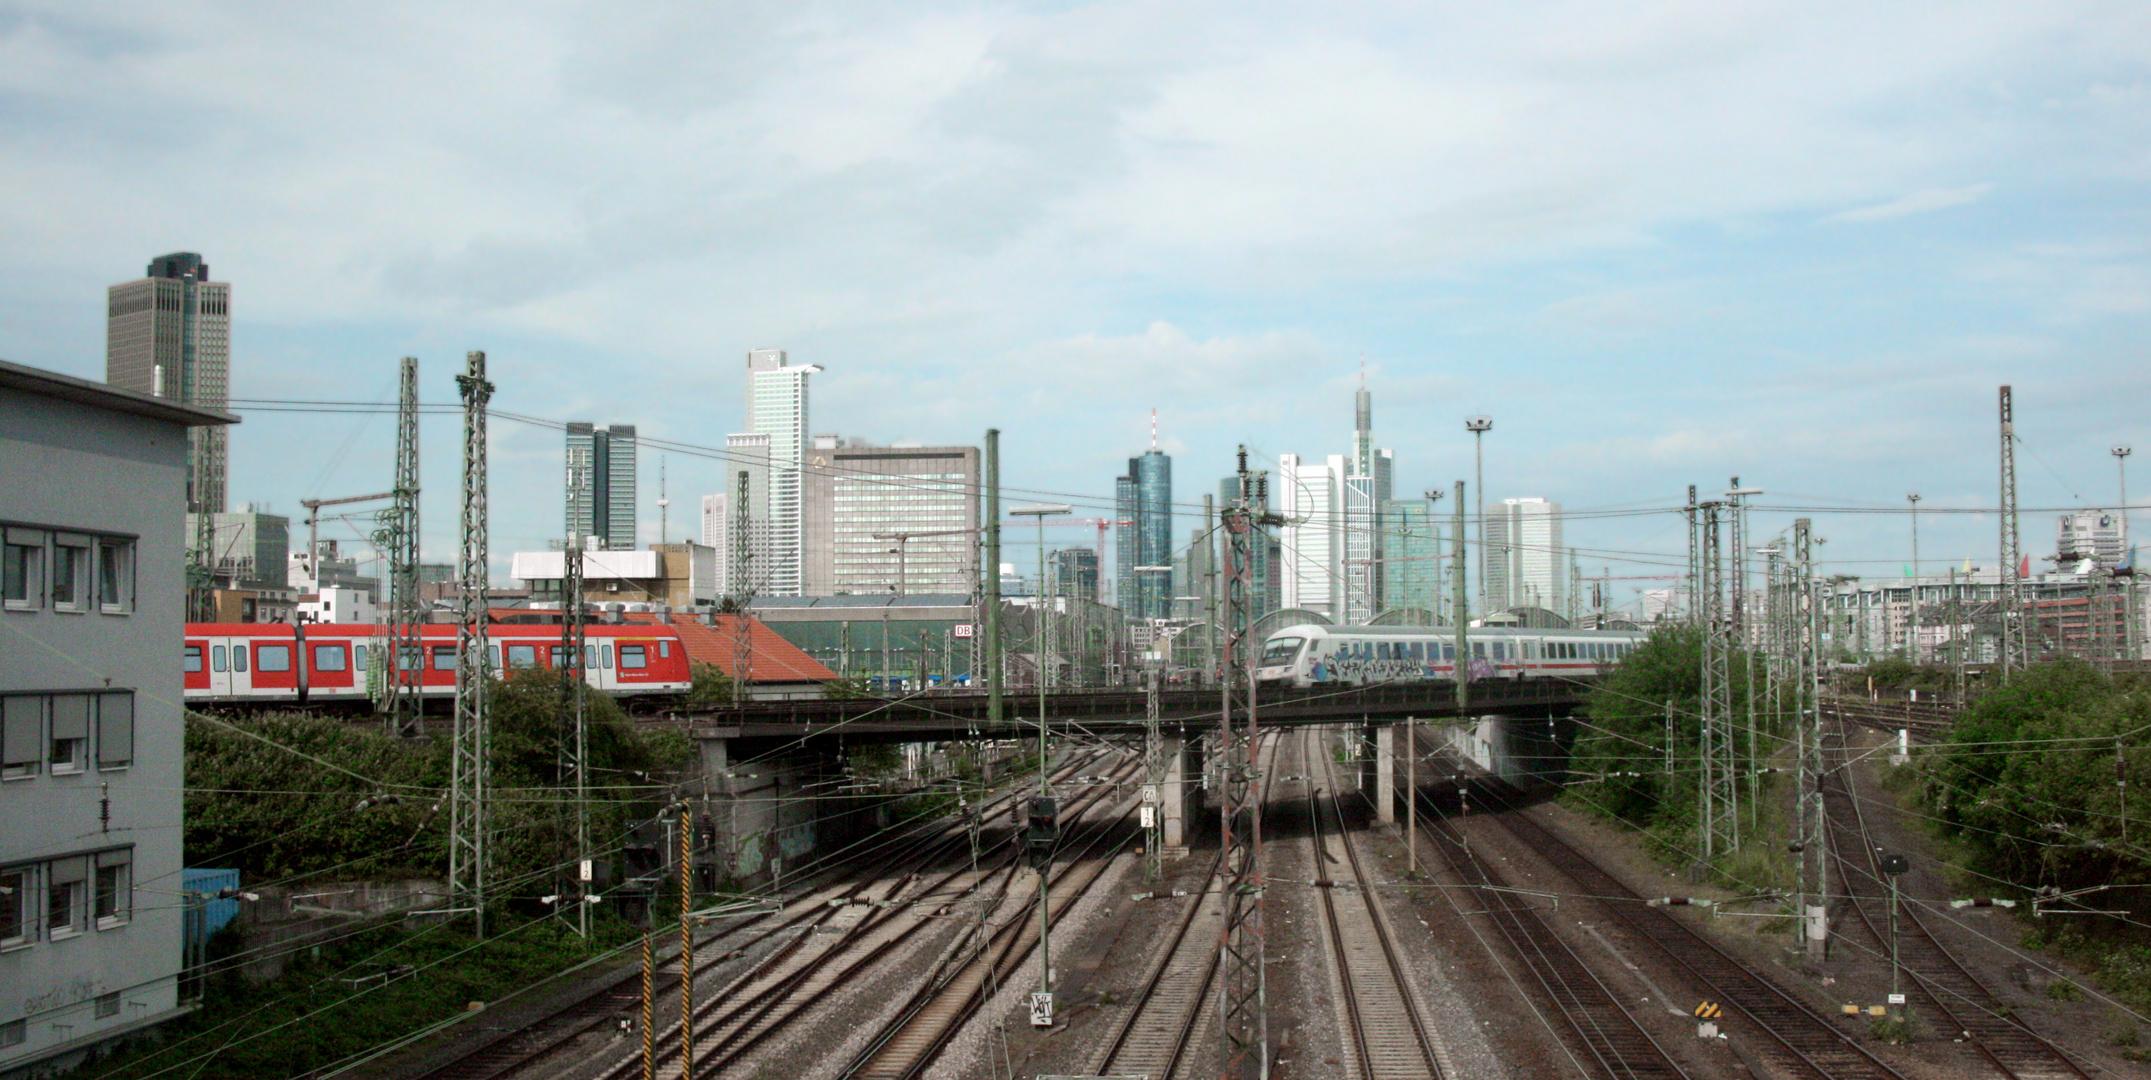 Chasing trains...